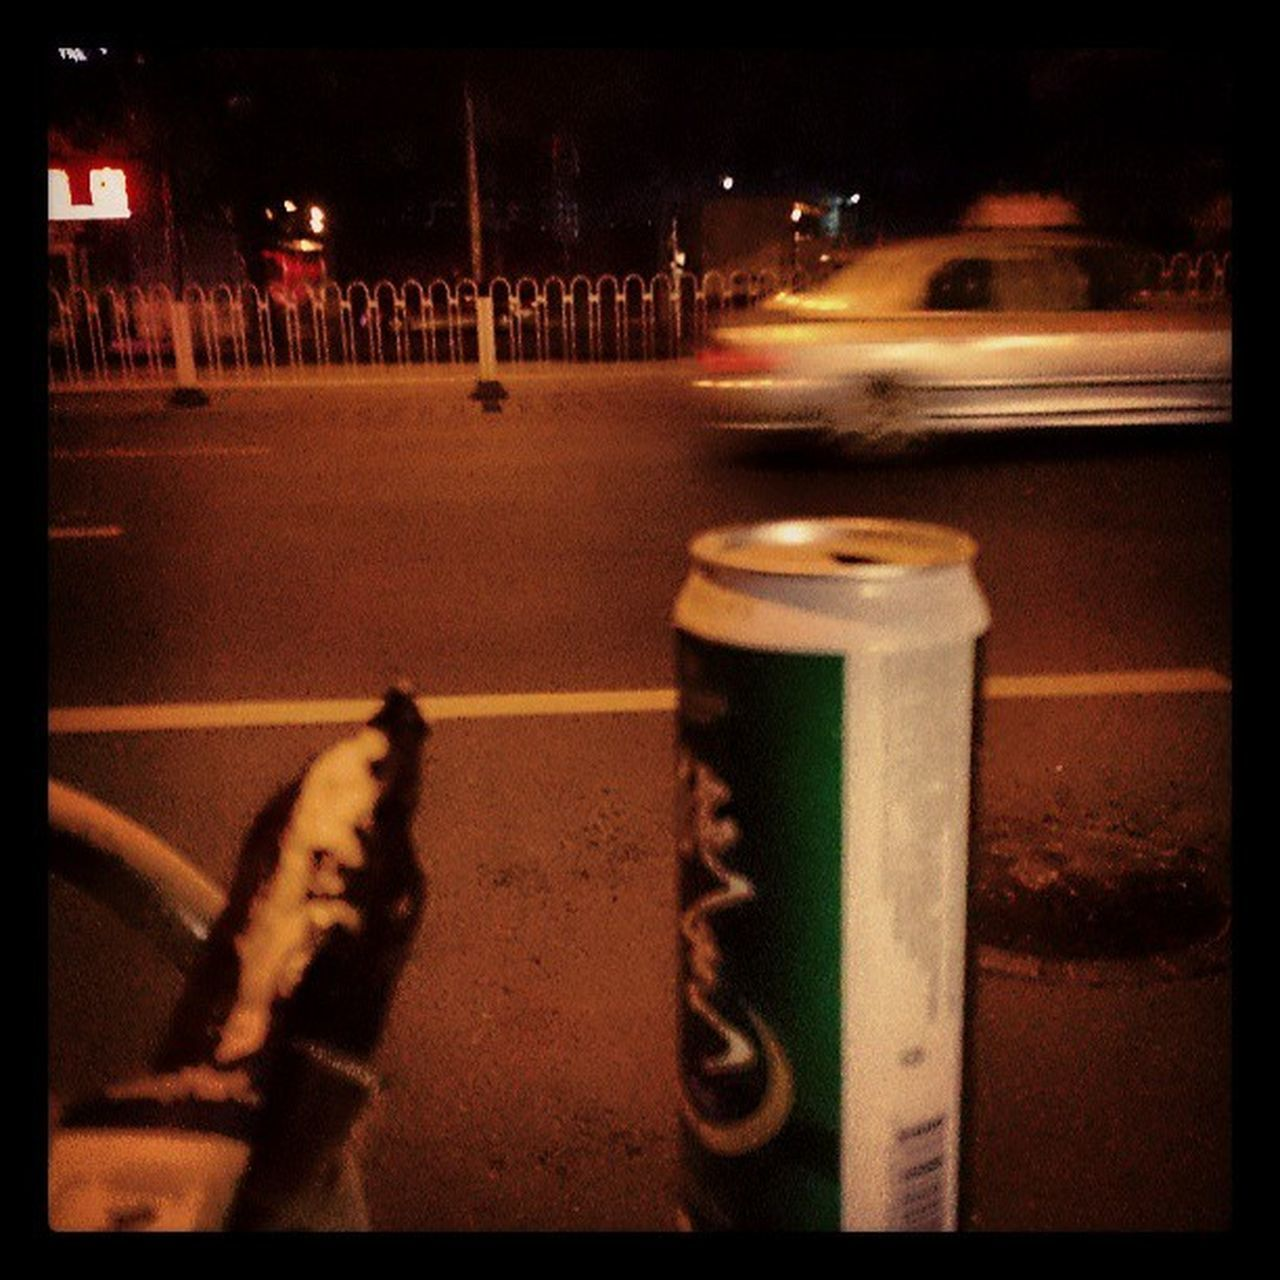 street, road, outdoors, night, transportation, car, no people, city, close-up, animal themes